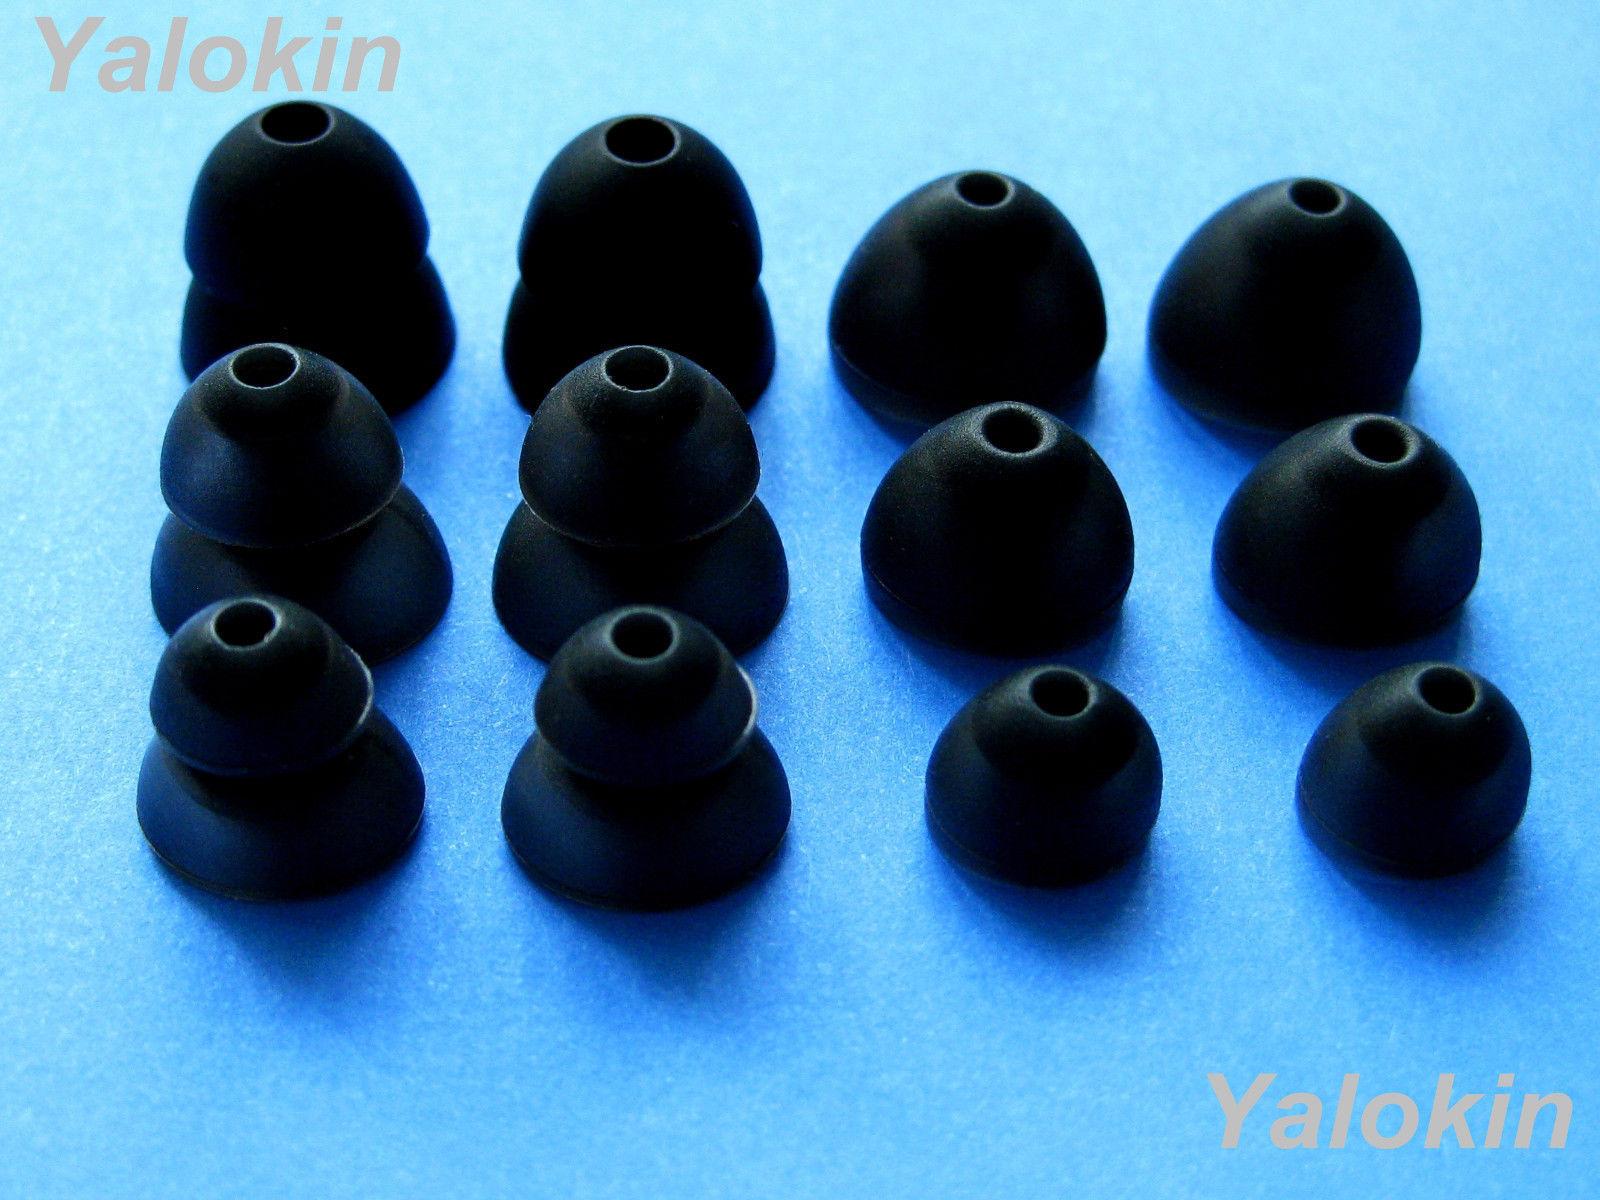 Replacement Eartips Gels Oval Comfort Fit Kit for Westone UM Series Earphones